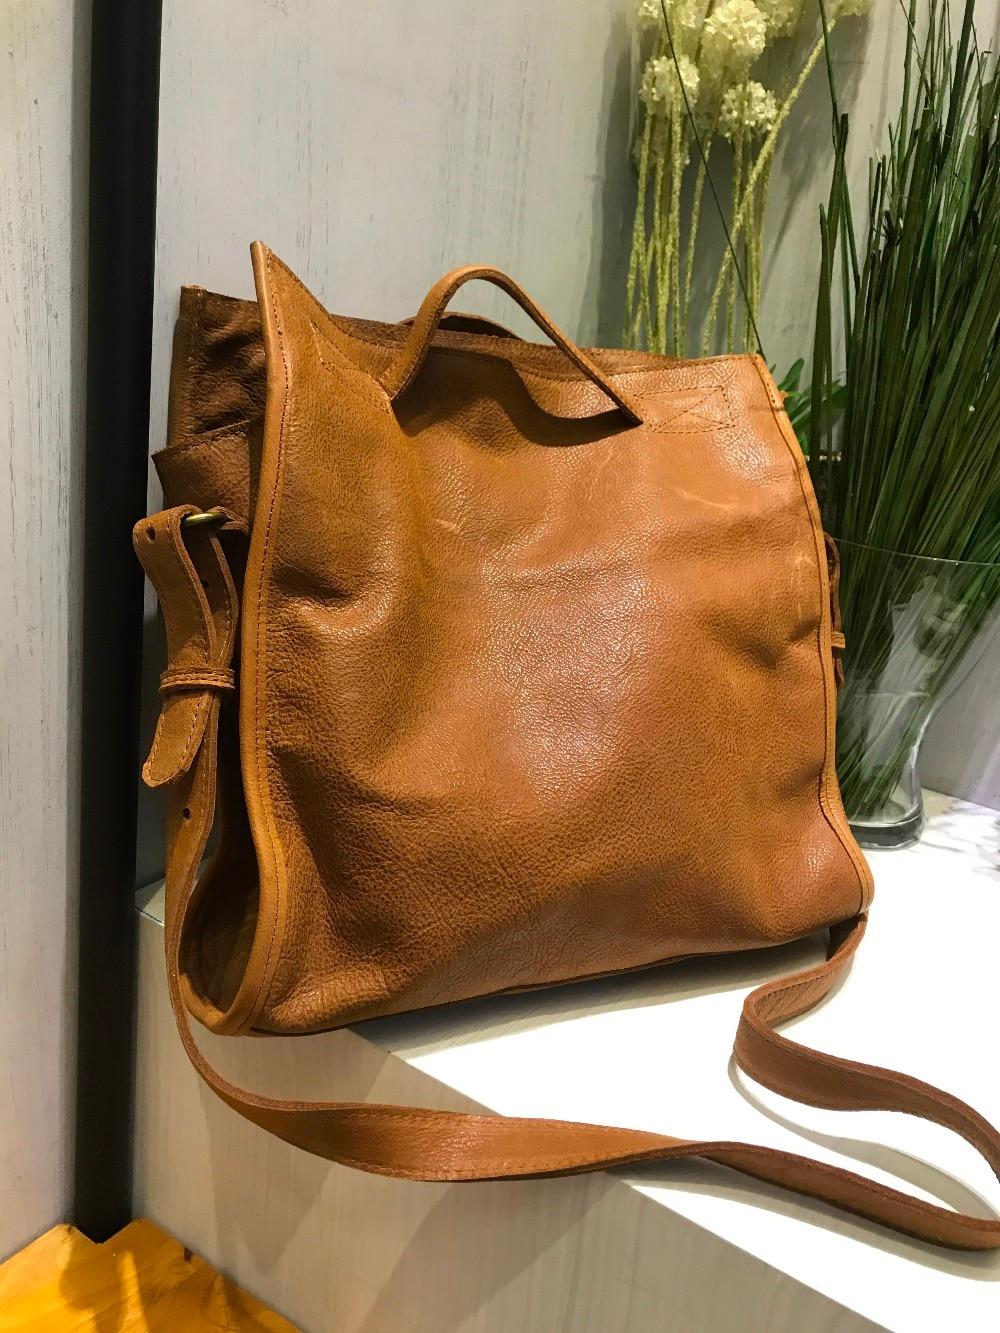 Vendange 2017 New fashion European and Amerian Style handmade Casual genuine leather handbag messenger bag business